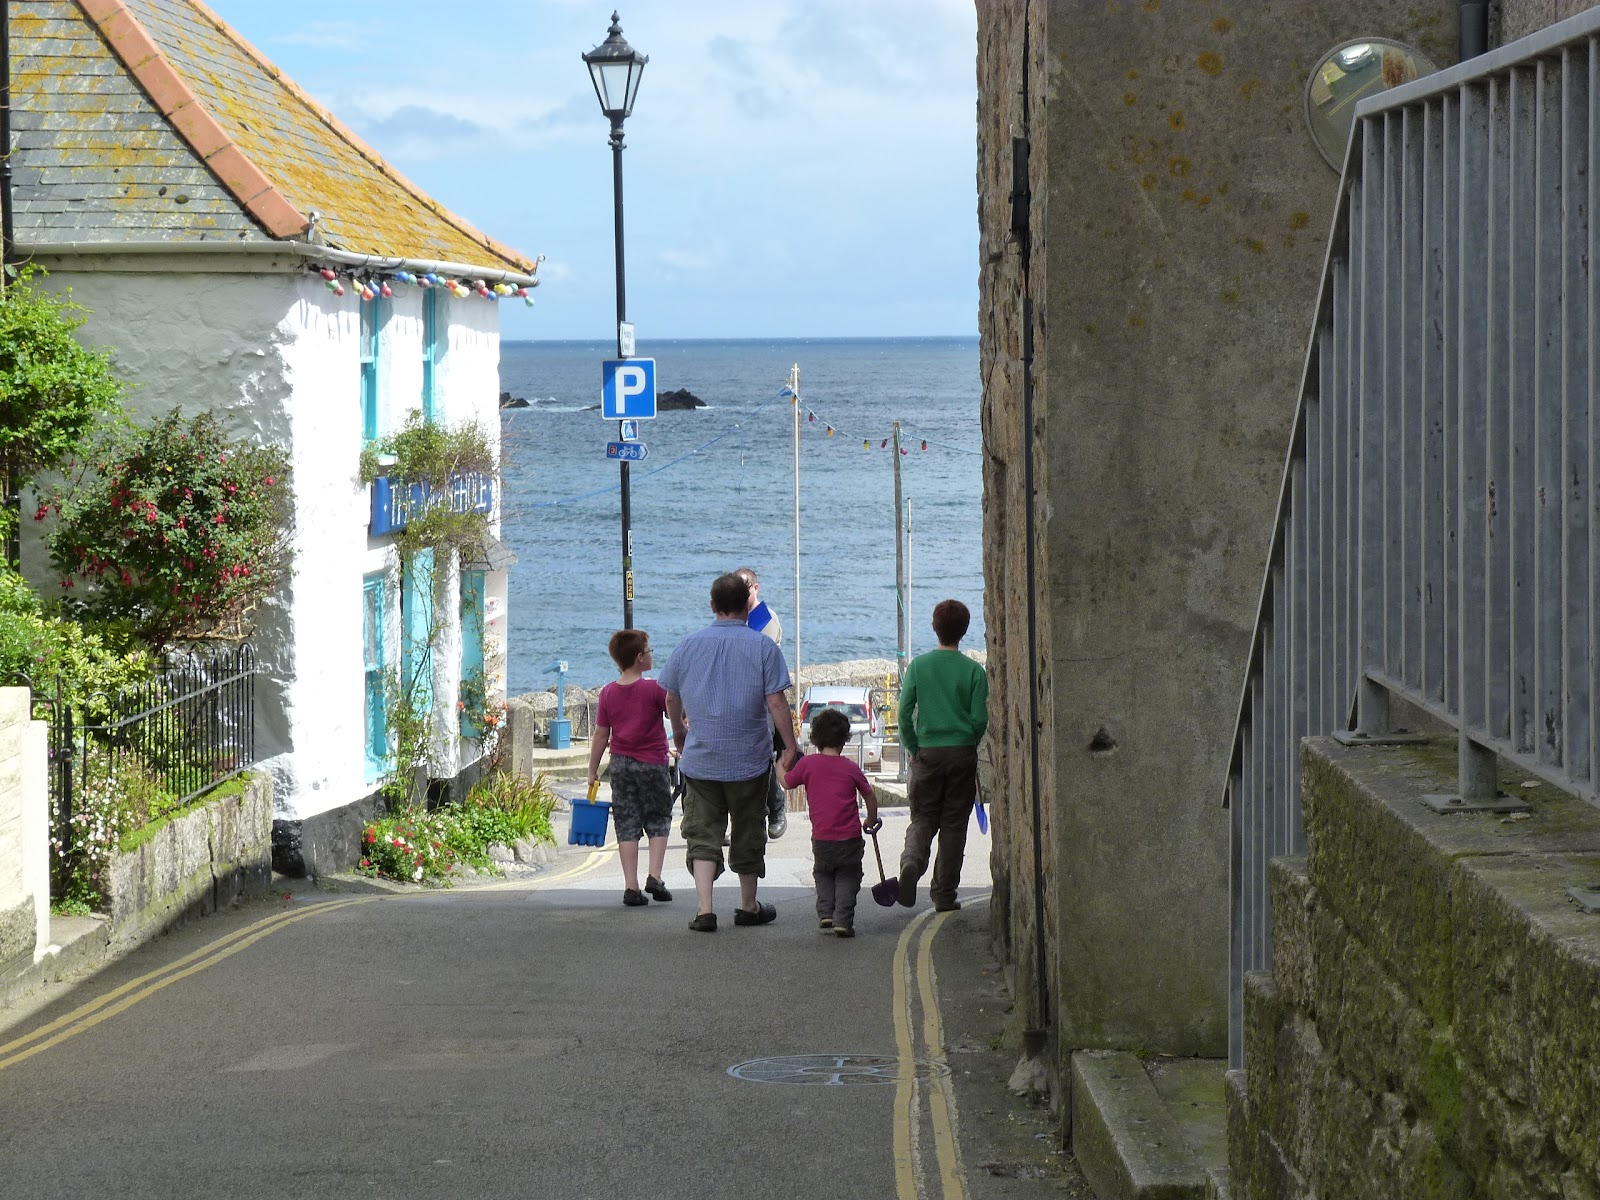 Narrow road in Cornish village